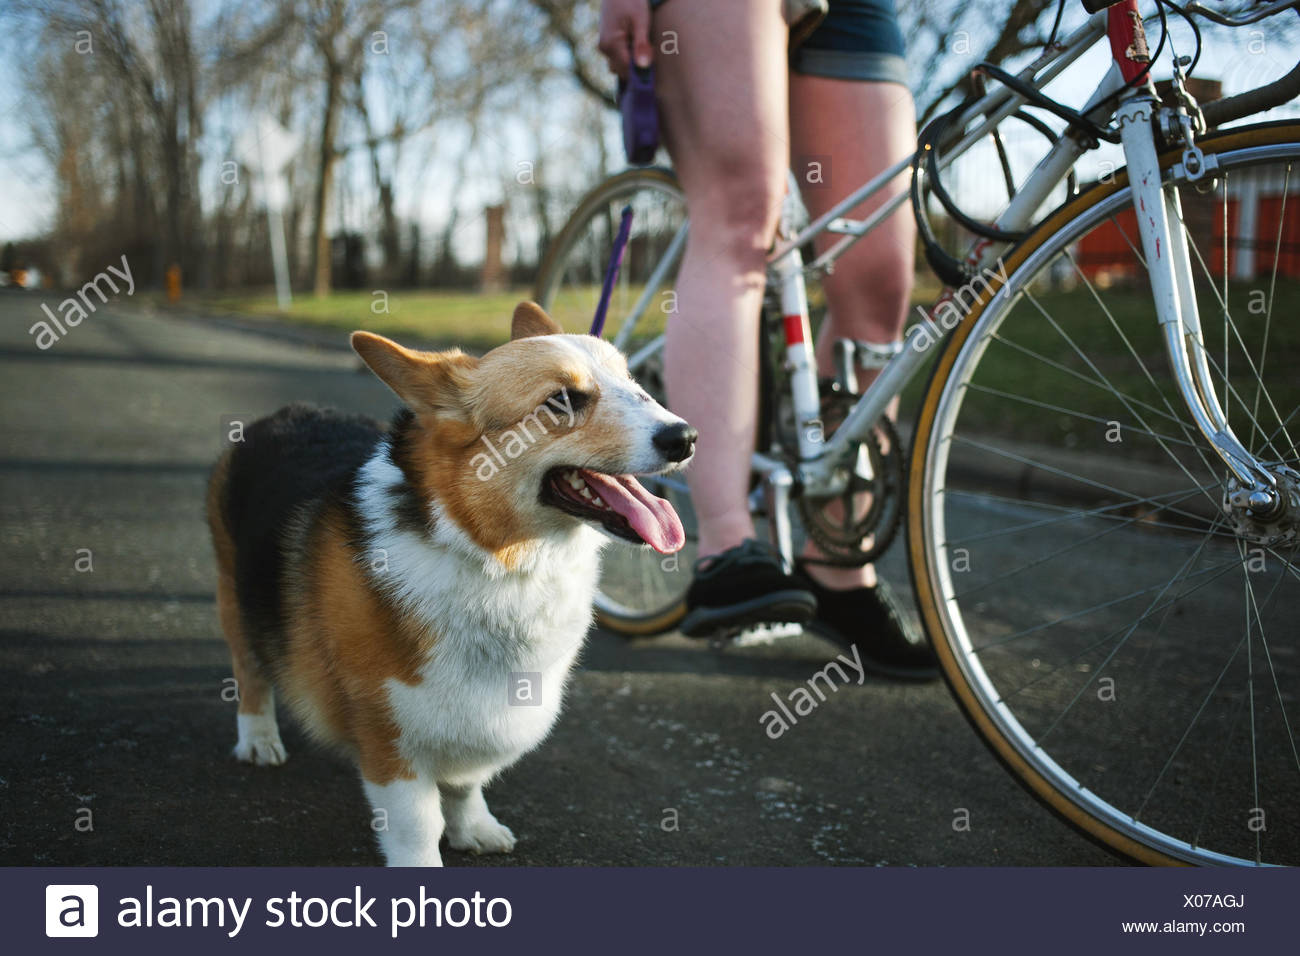 Pembroke Welsh Corgi de pie a lado de la mujer joven en bicicleta Imagen De Stock